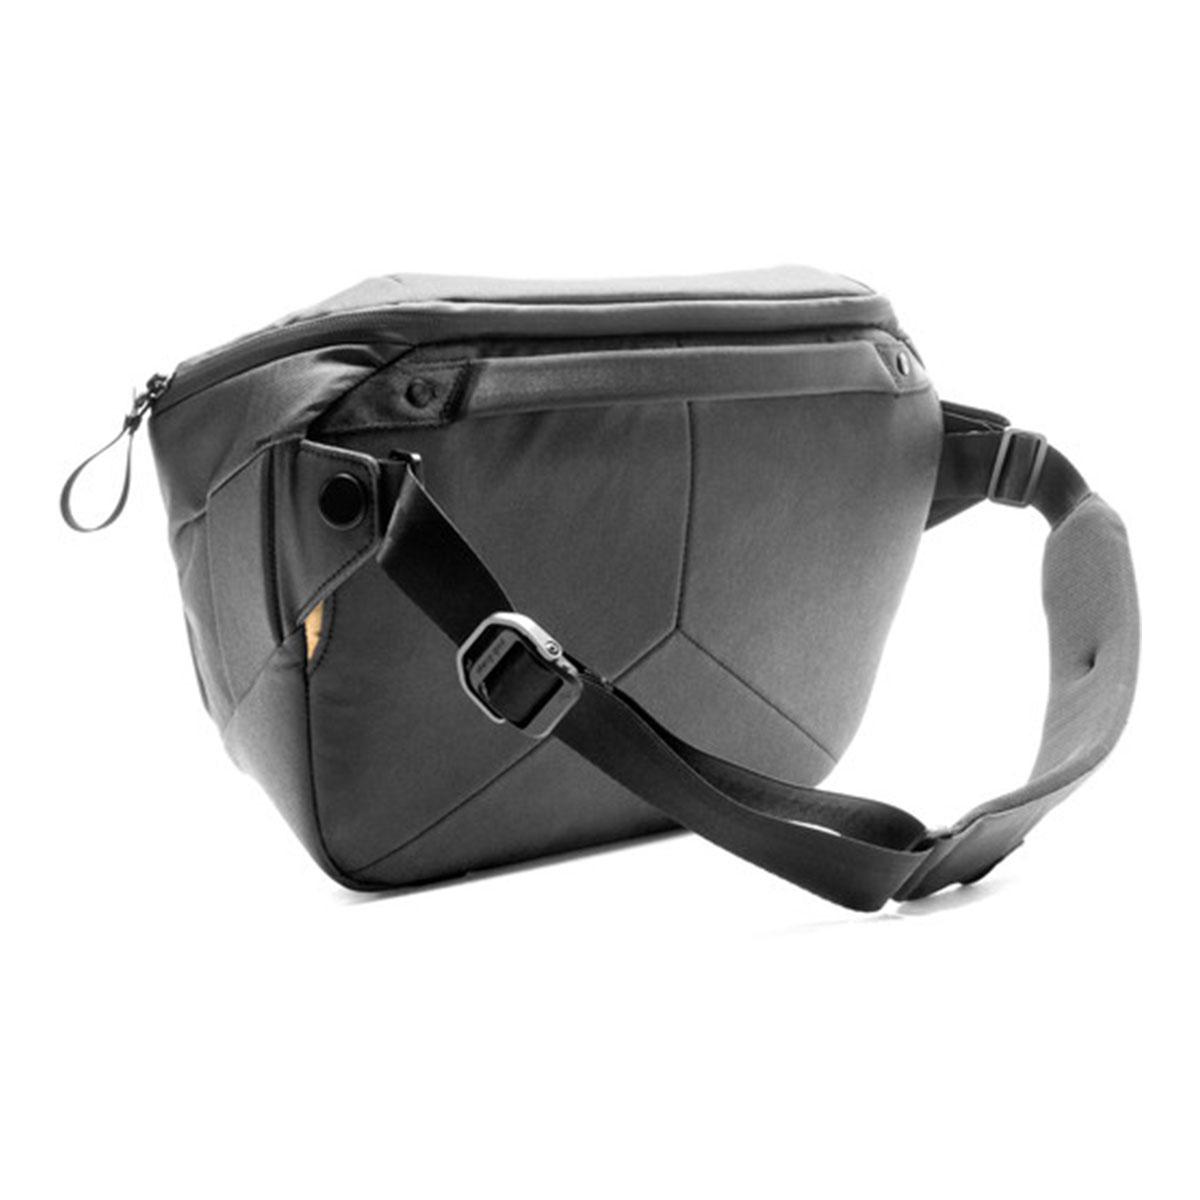 Peak Design Everyday Sling 10L Black